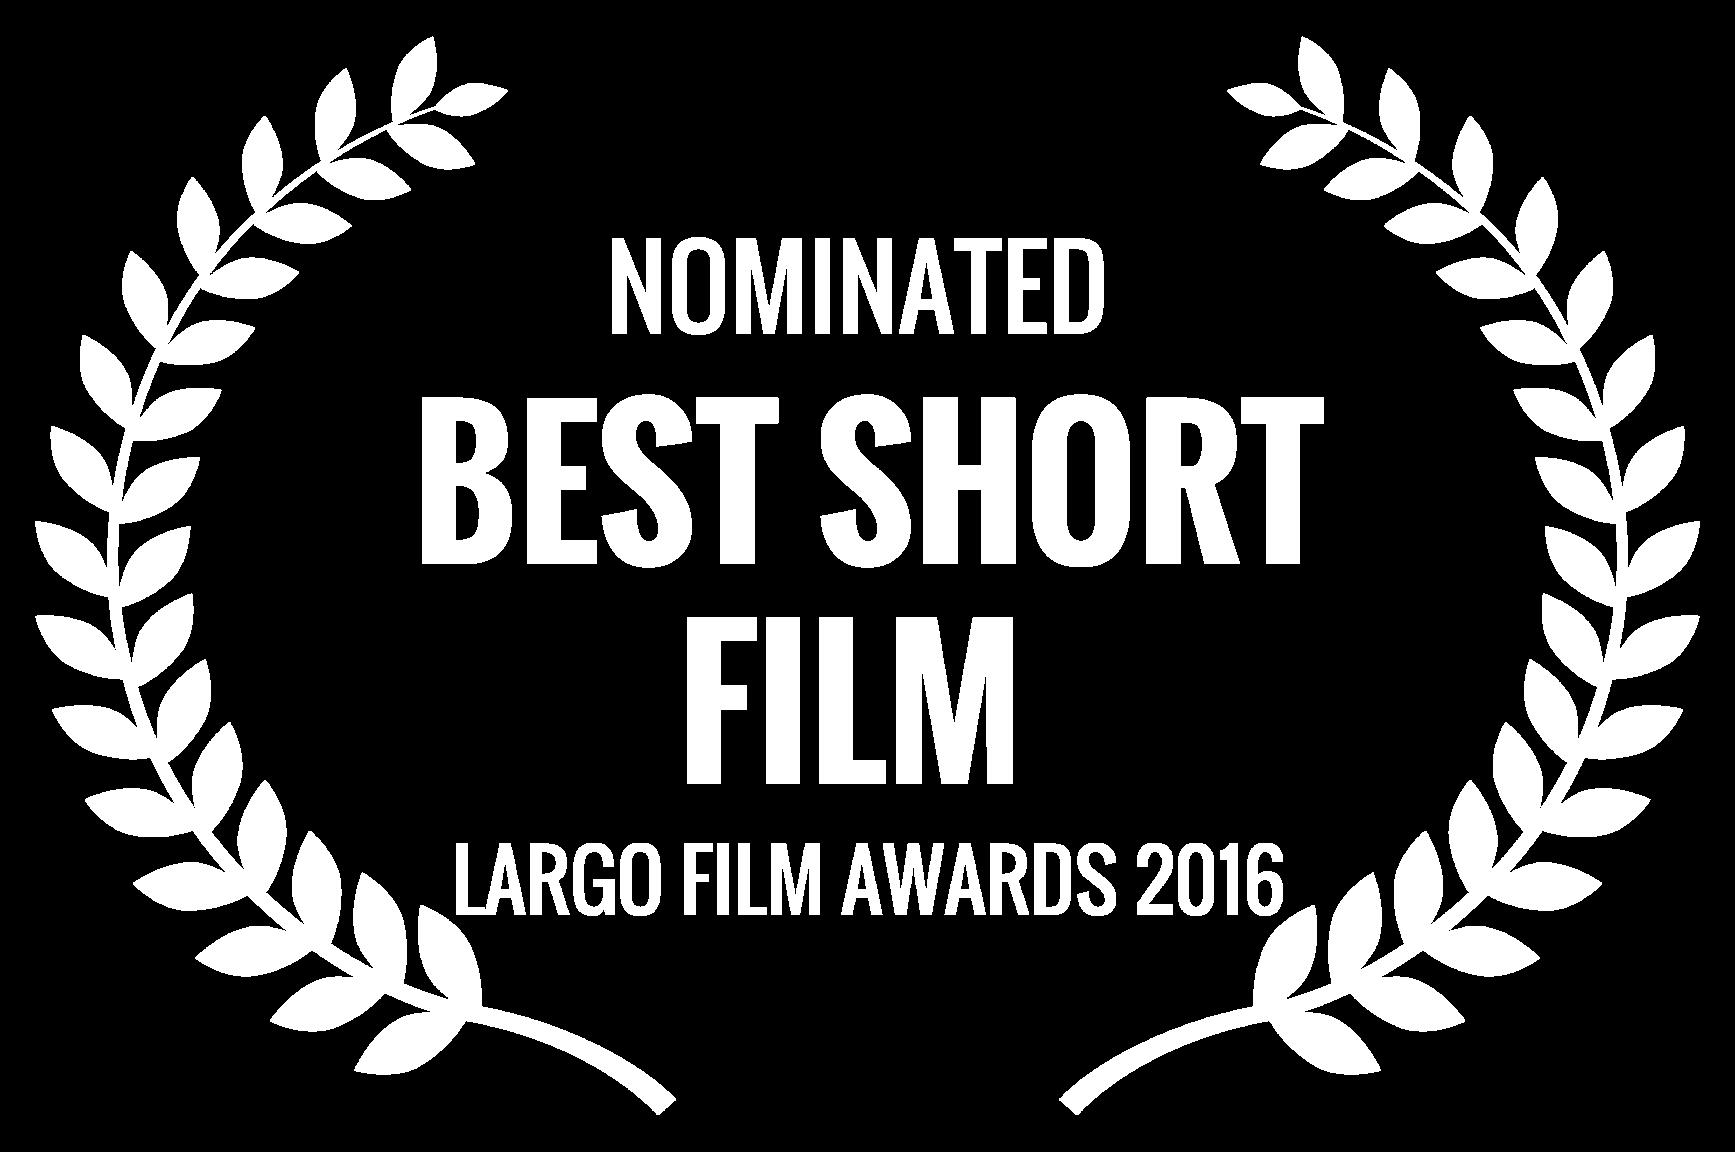 NOMINATED  - BEST SHORT FILM  - LARGO FILM AWARDS 2016 (1).png